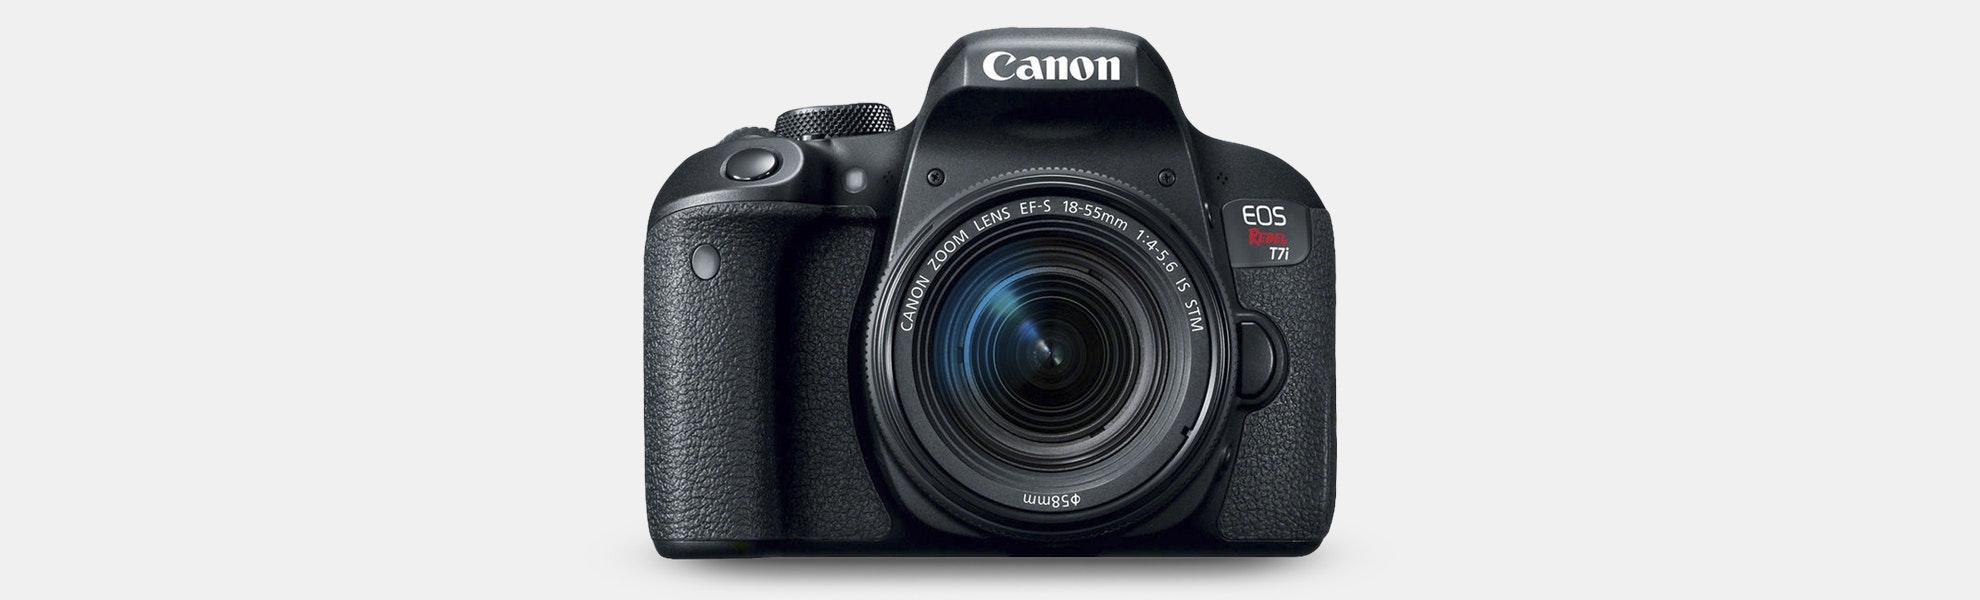 Canon EOS T7i DSLR Camera w/ 18–55mm Lens